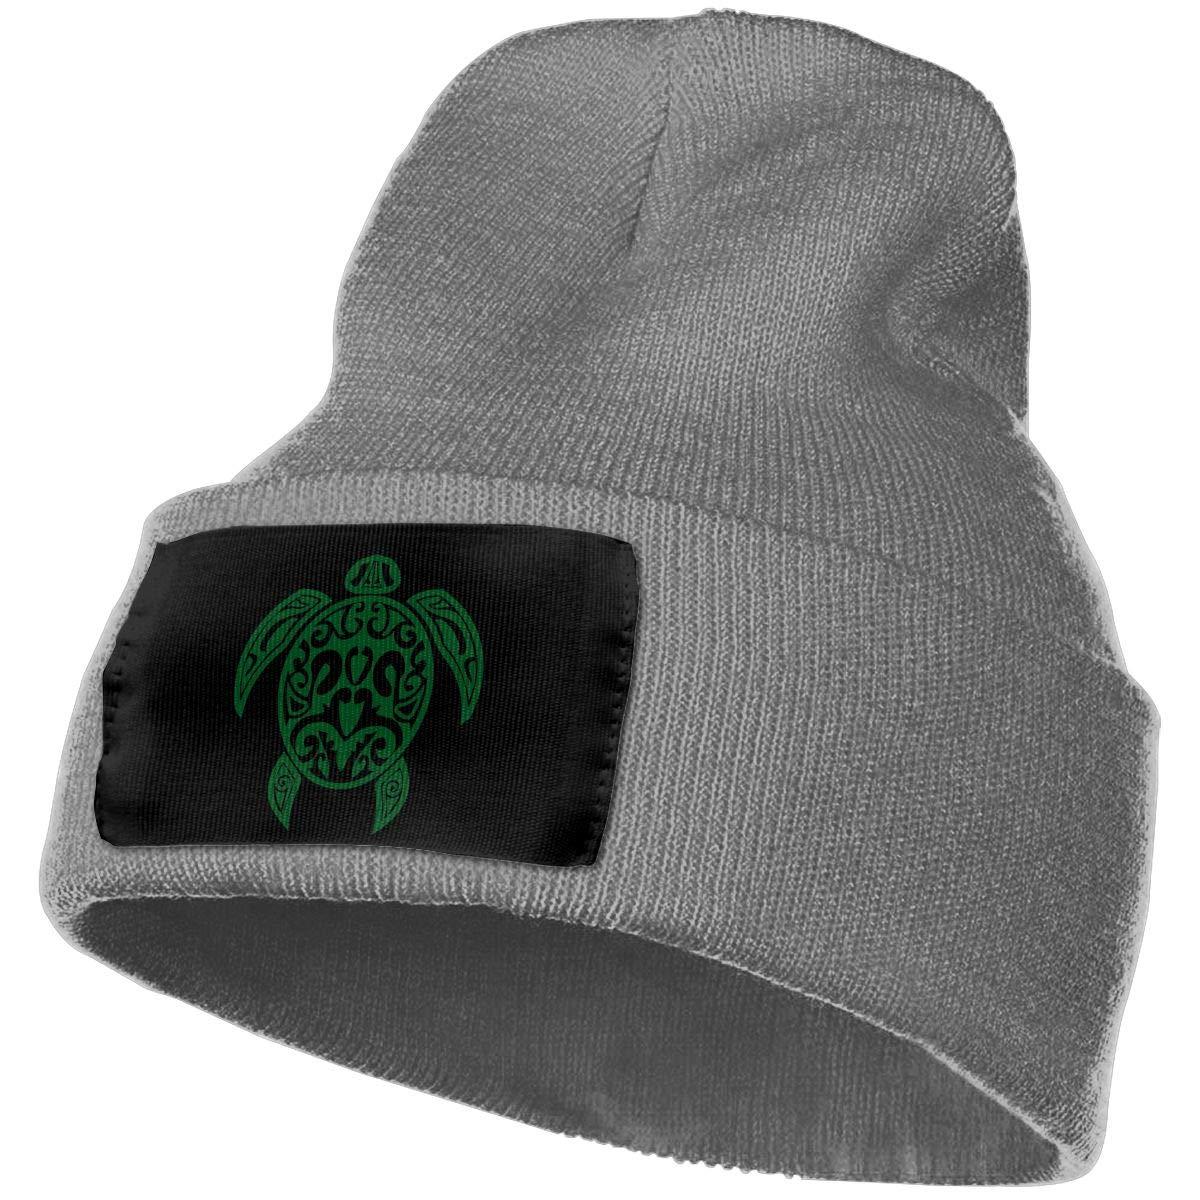 Unisex Hawaiian Sea Turtle Outdoor Fashion Knit Beanies Hat Soft Winter Skull Caps